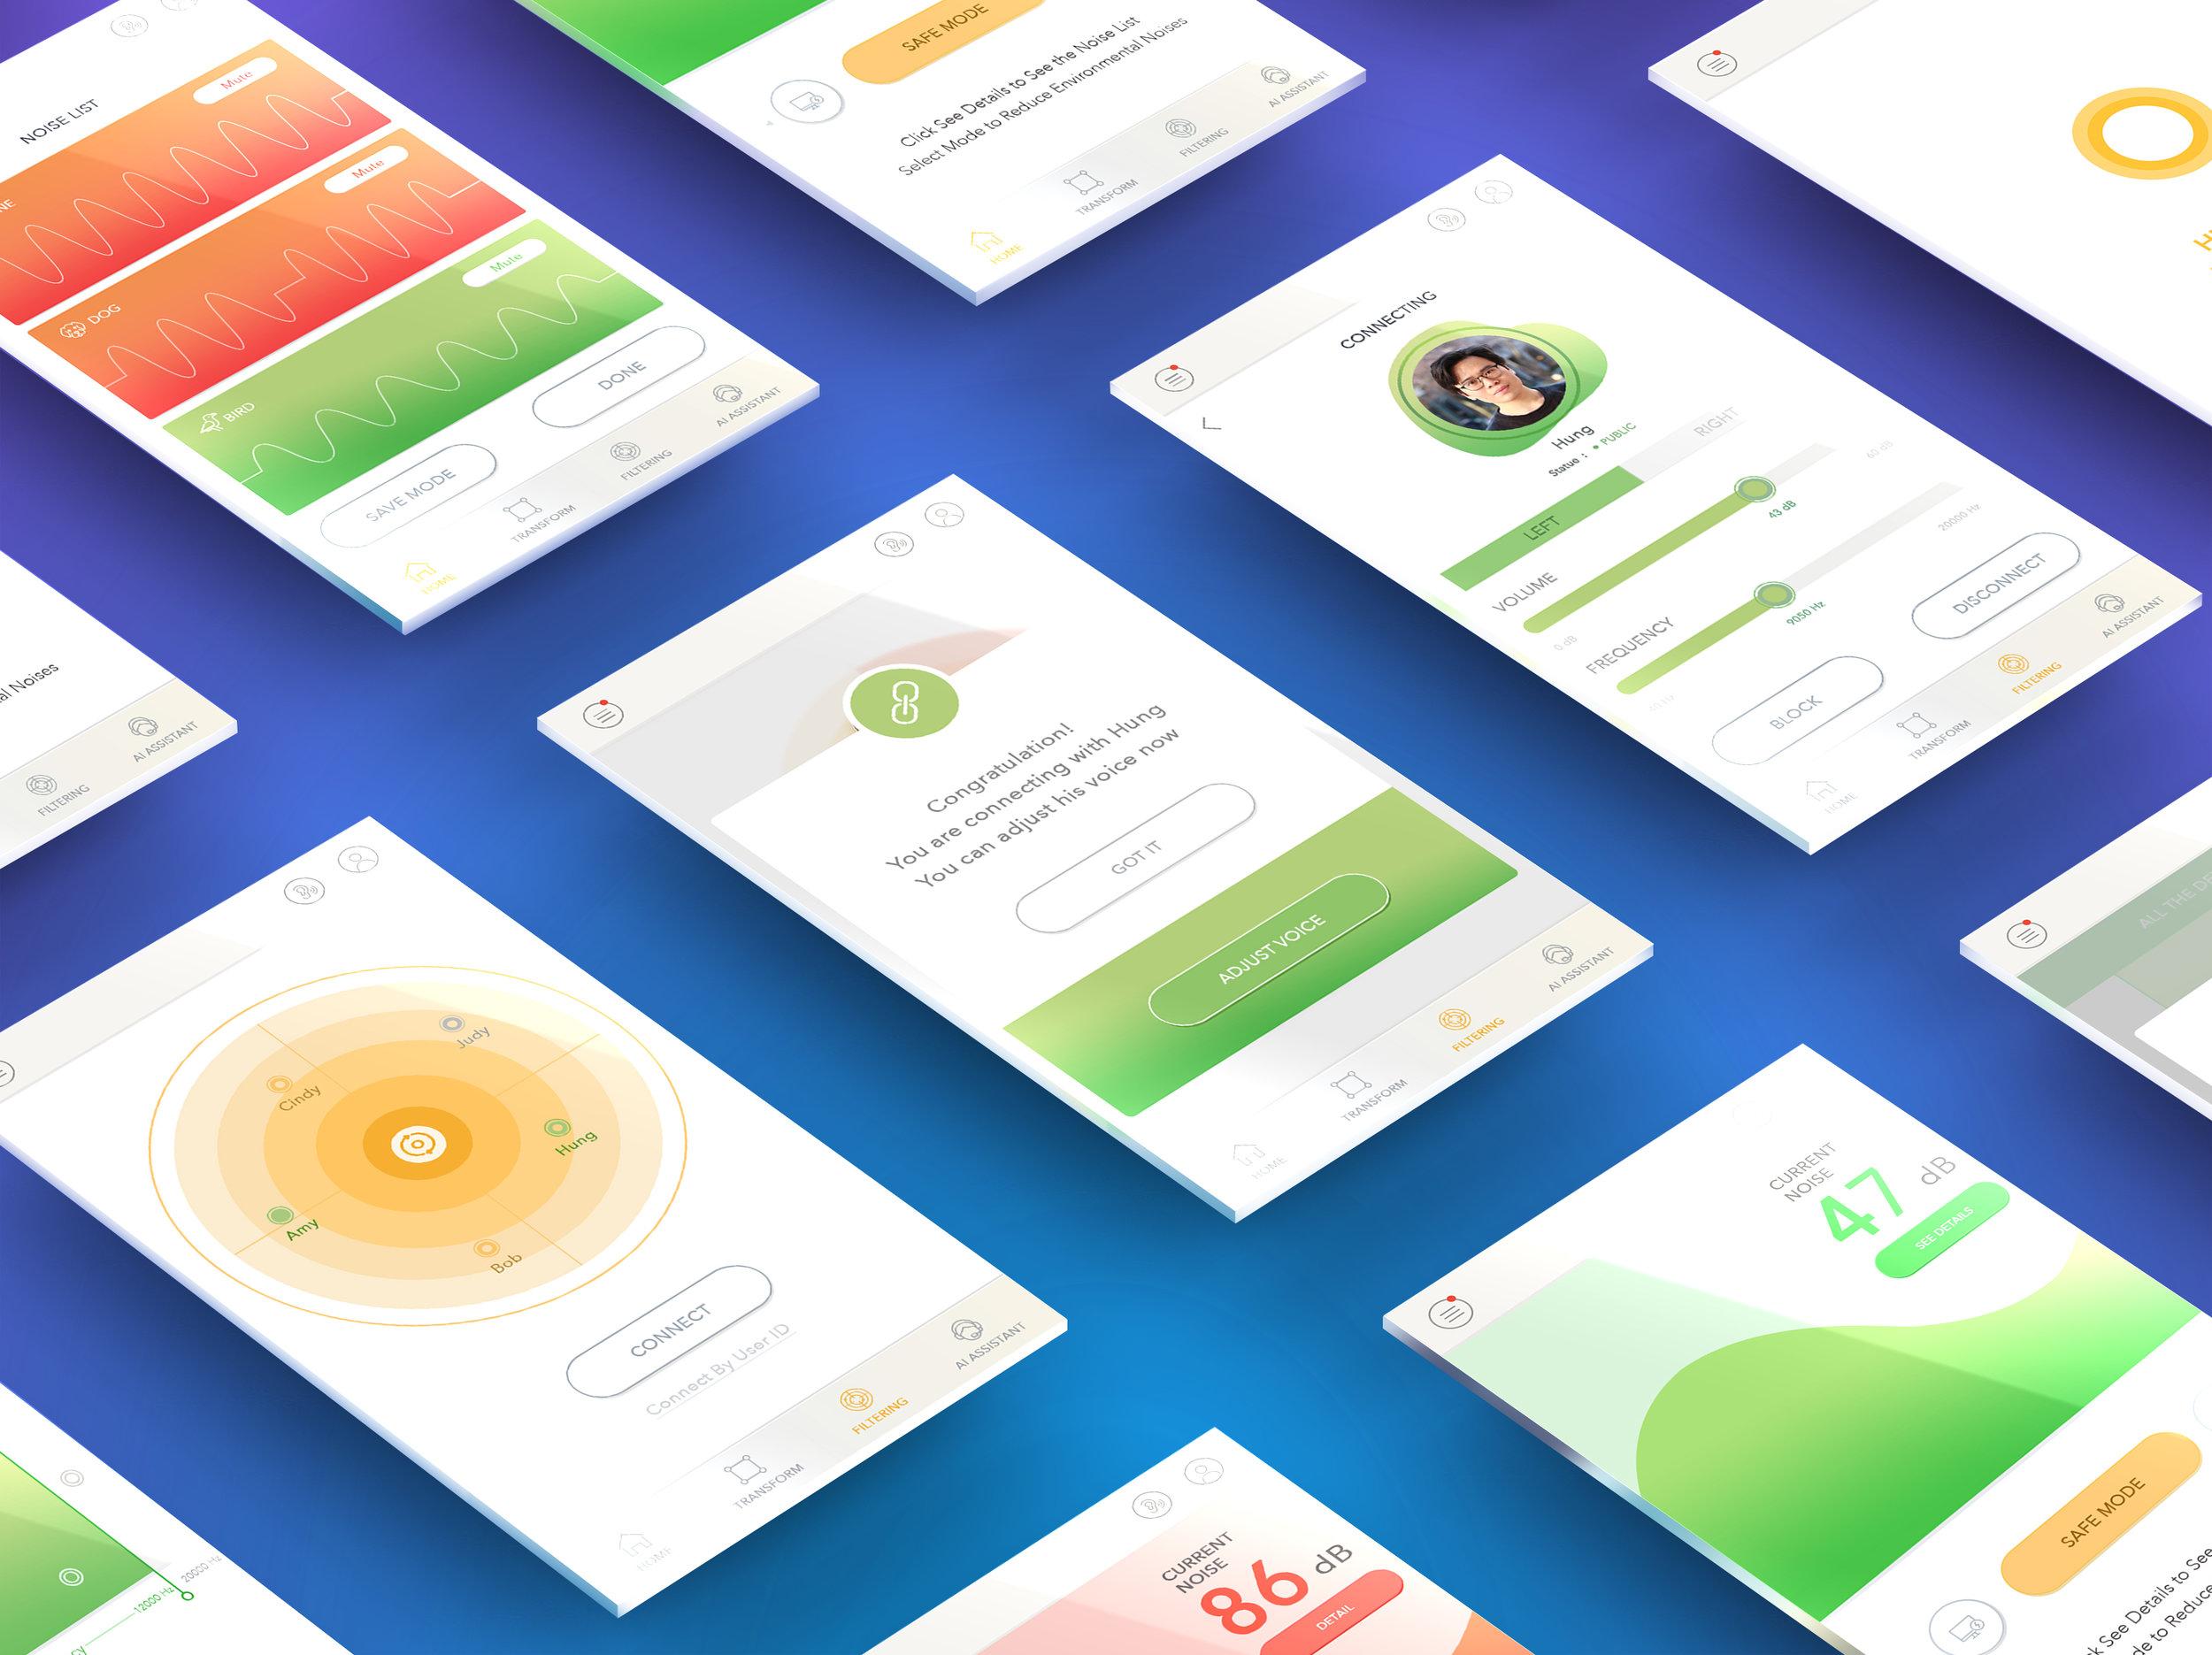 app layout.jpg